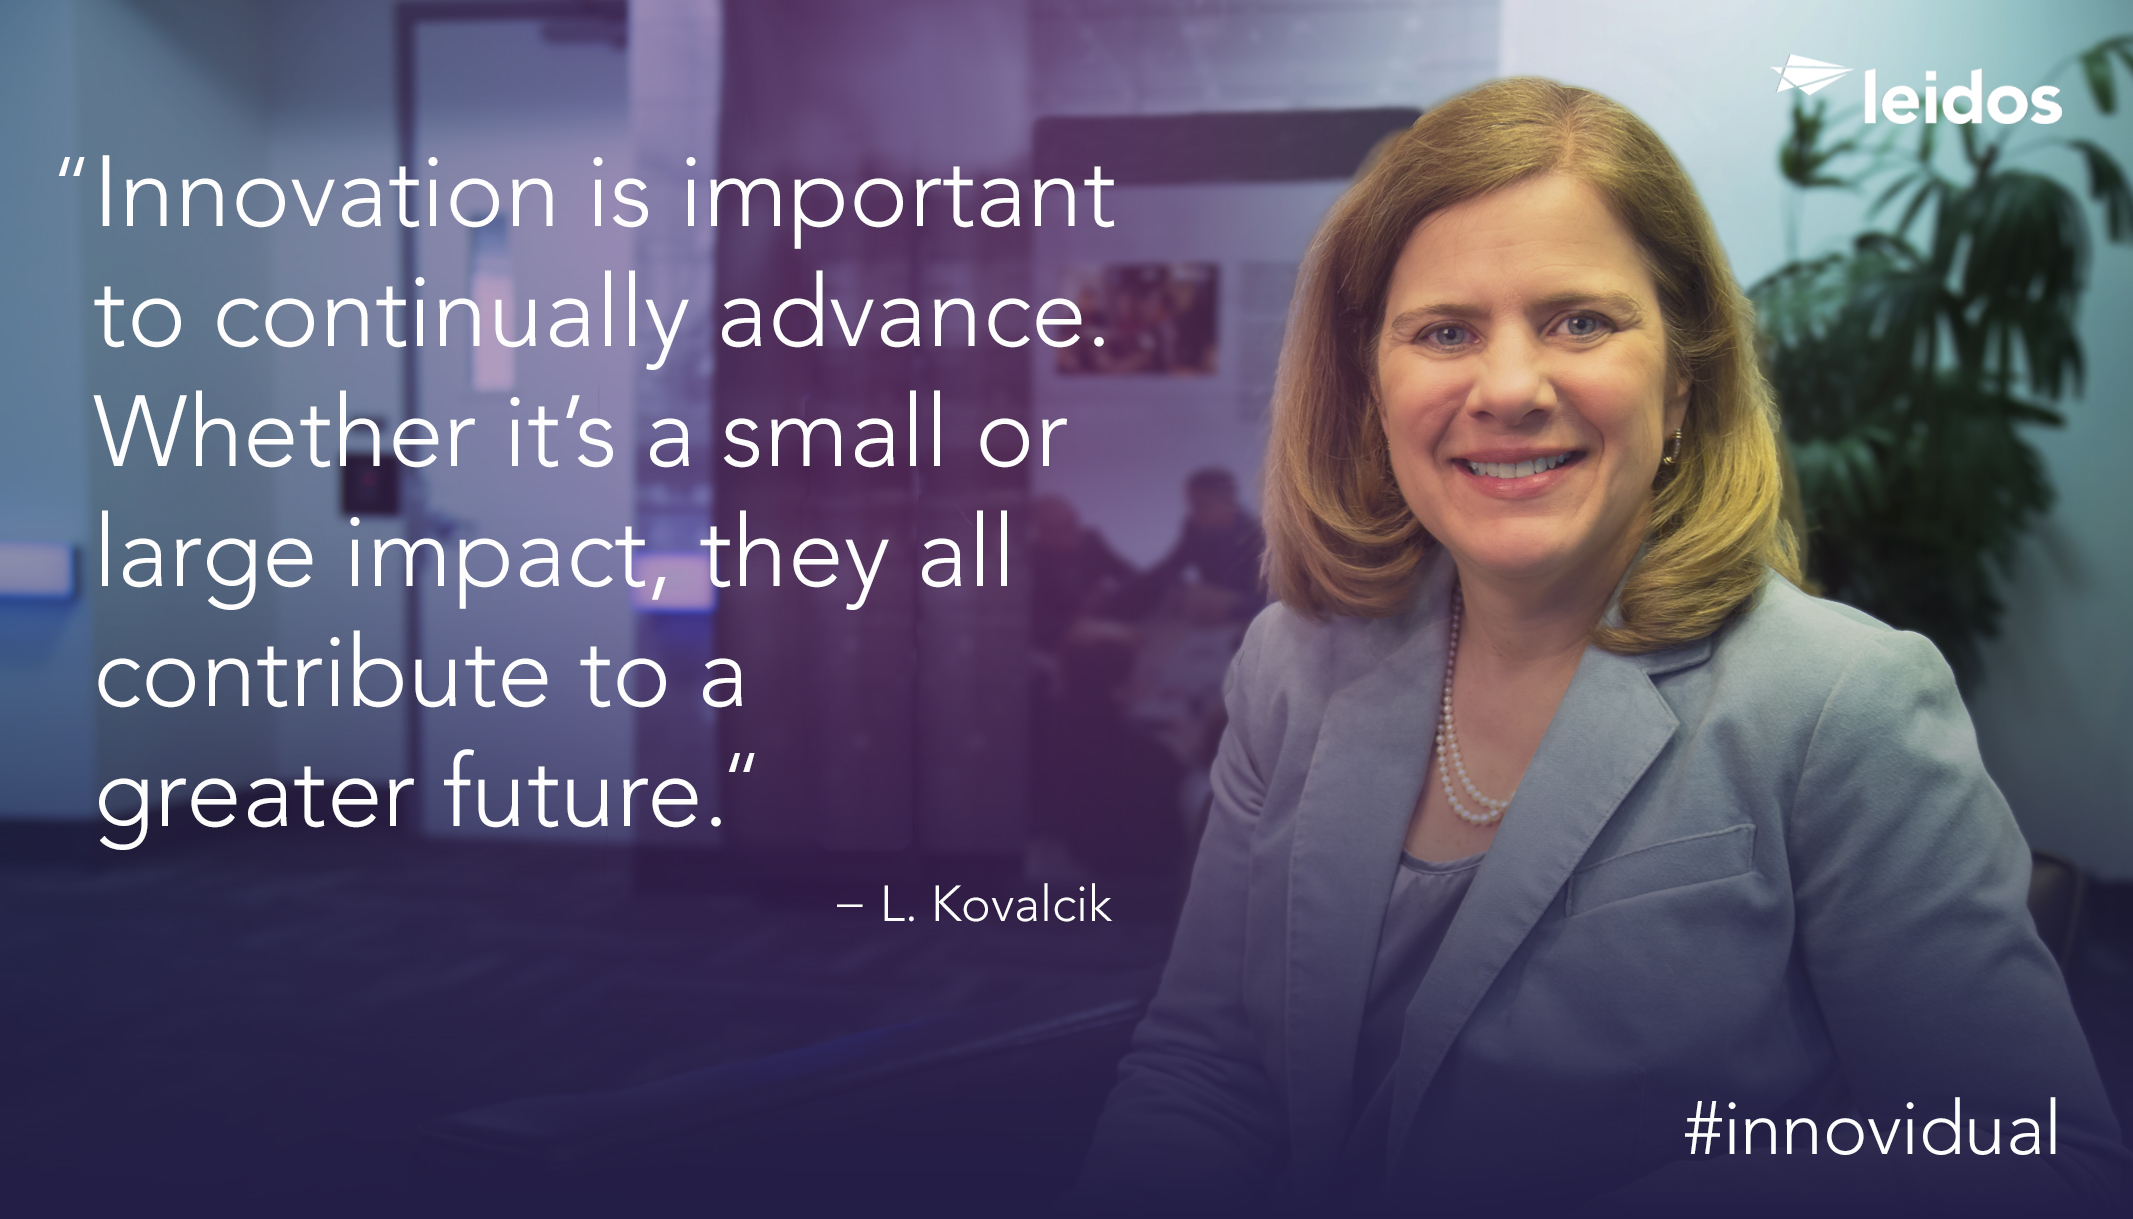 Luanne Kovalcik is the program manager for the Time Based Flow Management (TBFM) program at Leidos.